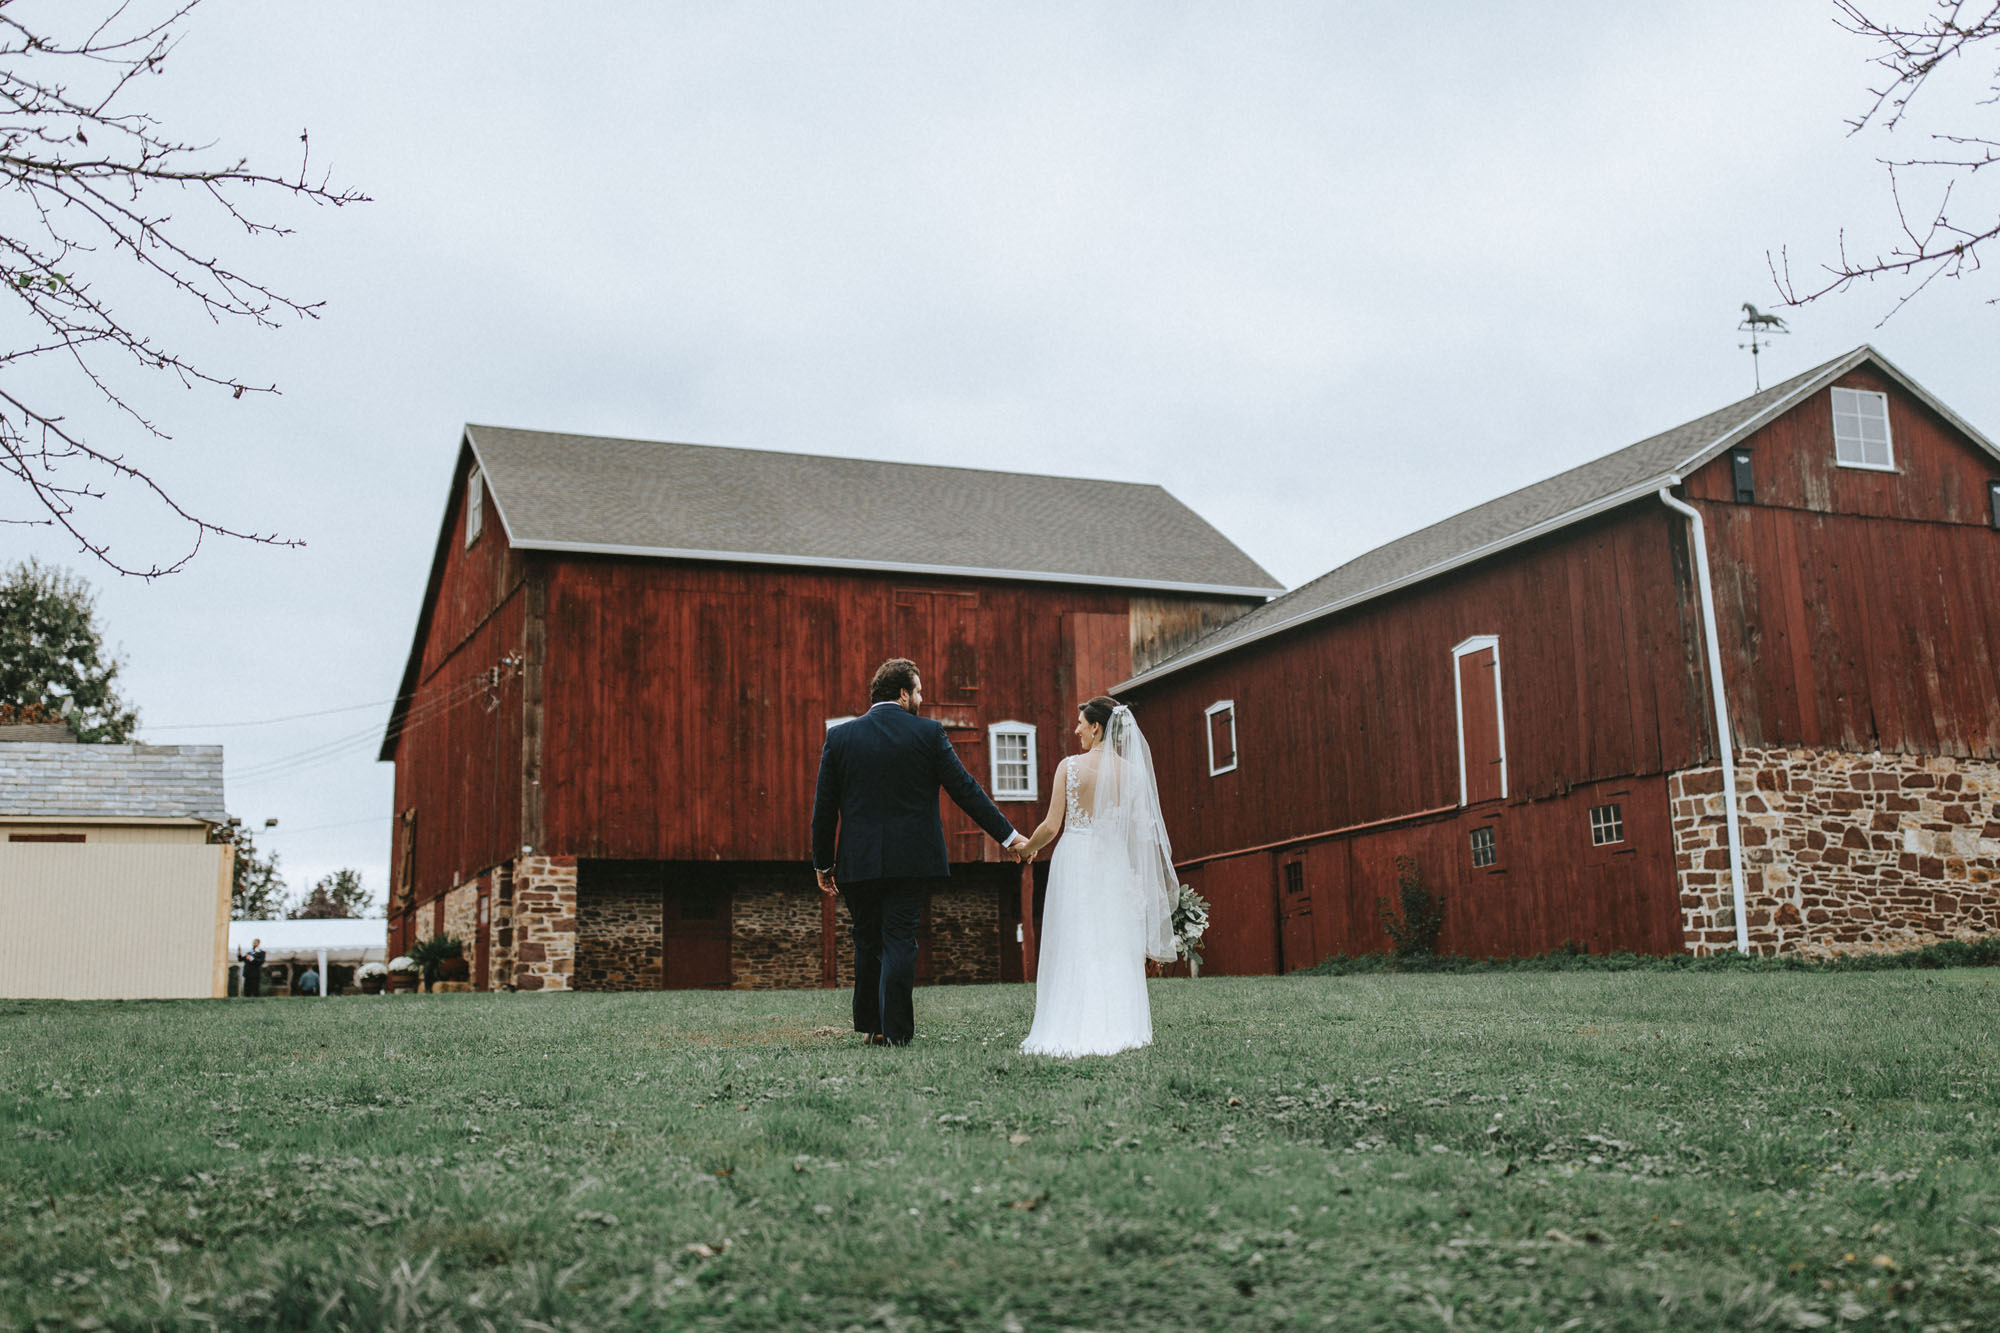 Twisted-Oaks-Studio-Arianne-Sean-Wedding-202.jpg